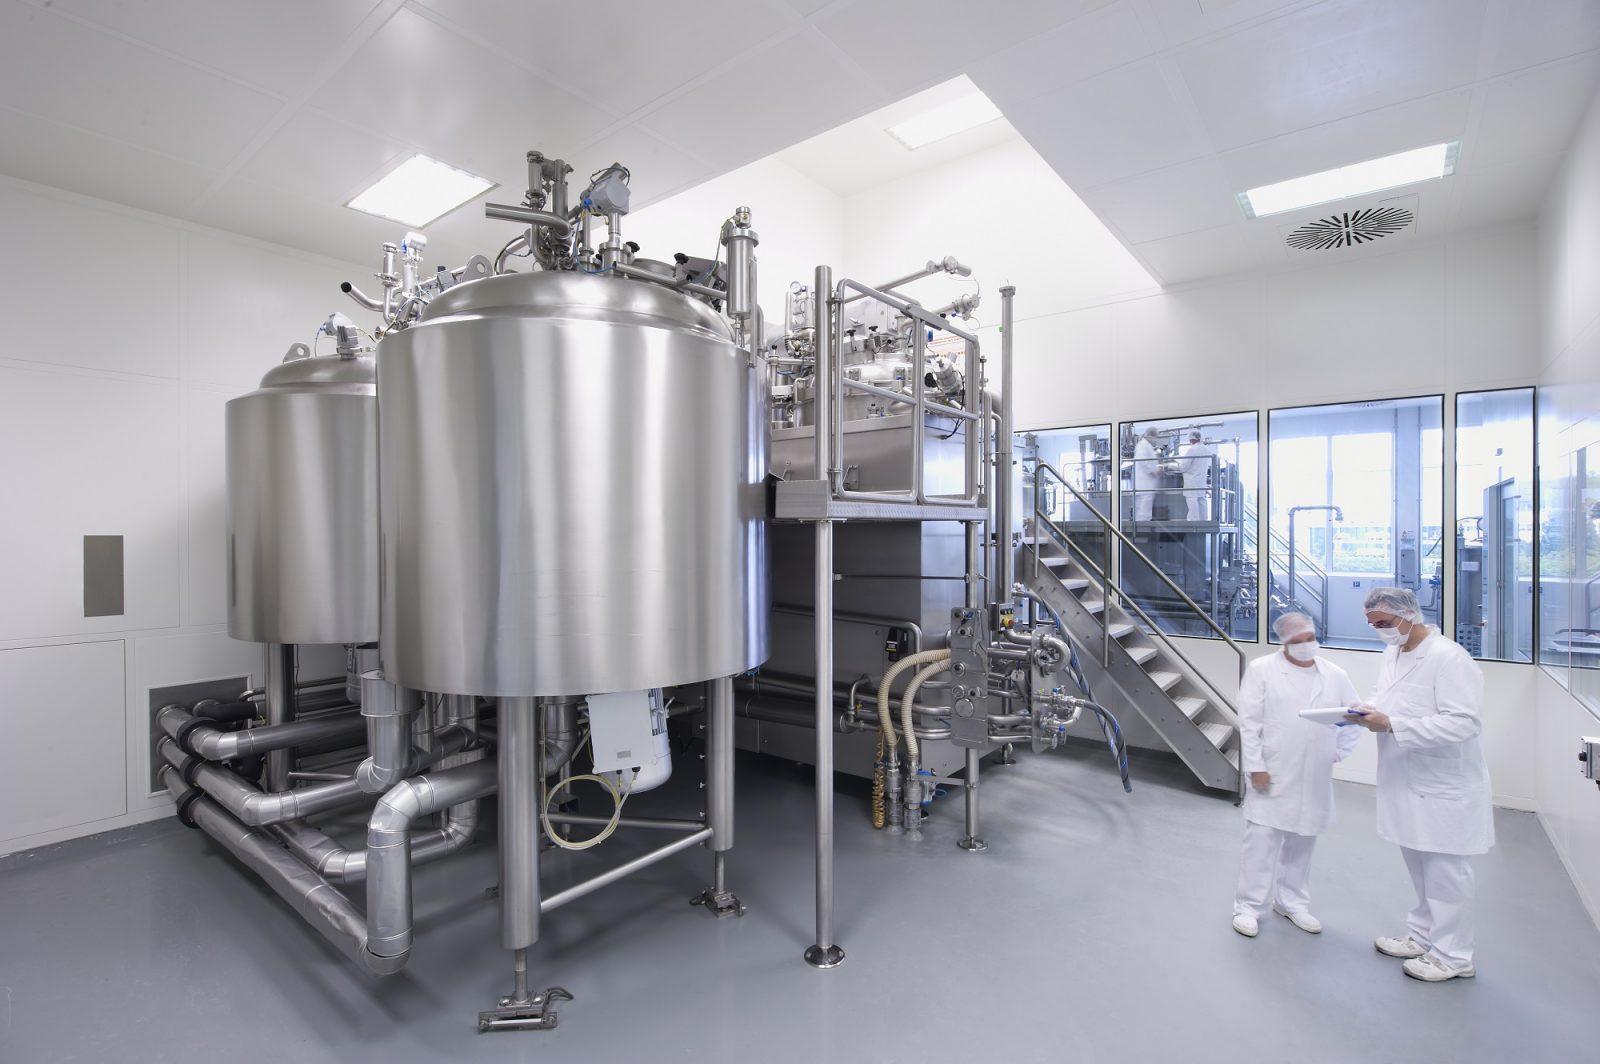 Pharmaprodukte Lohnhersteller Arzneimittel Kosmetika Medizinprodukte Fullservice Zertifizierung